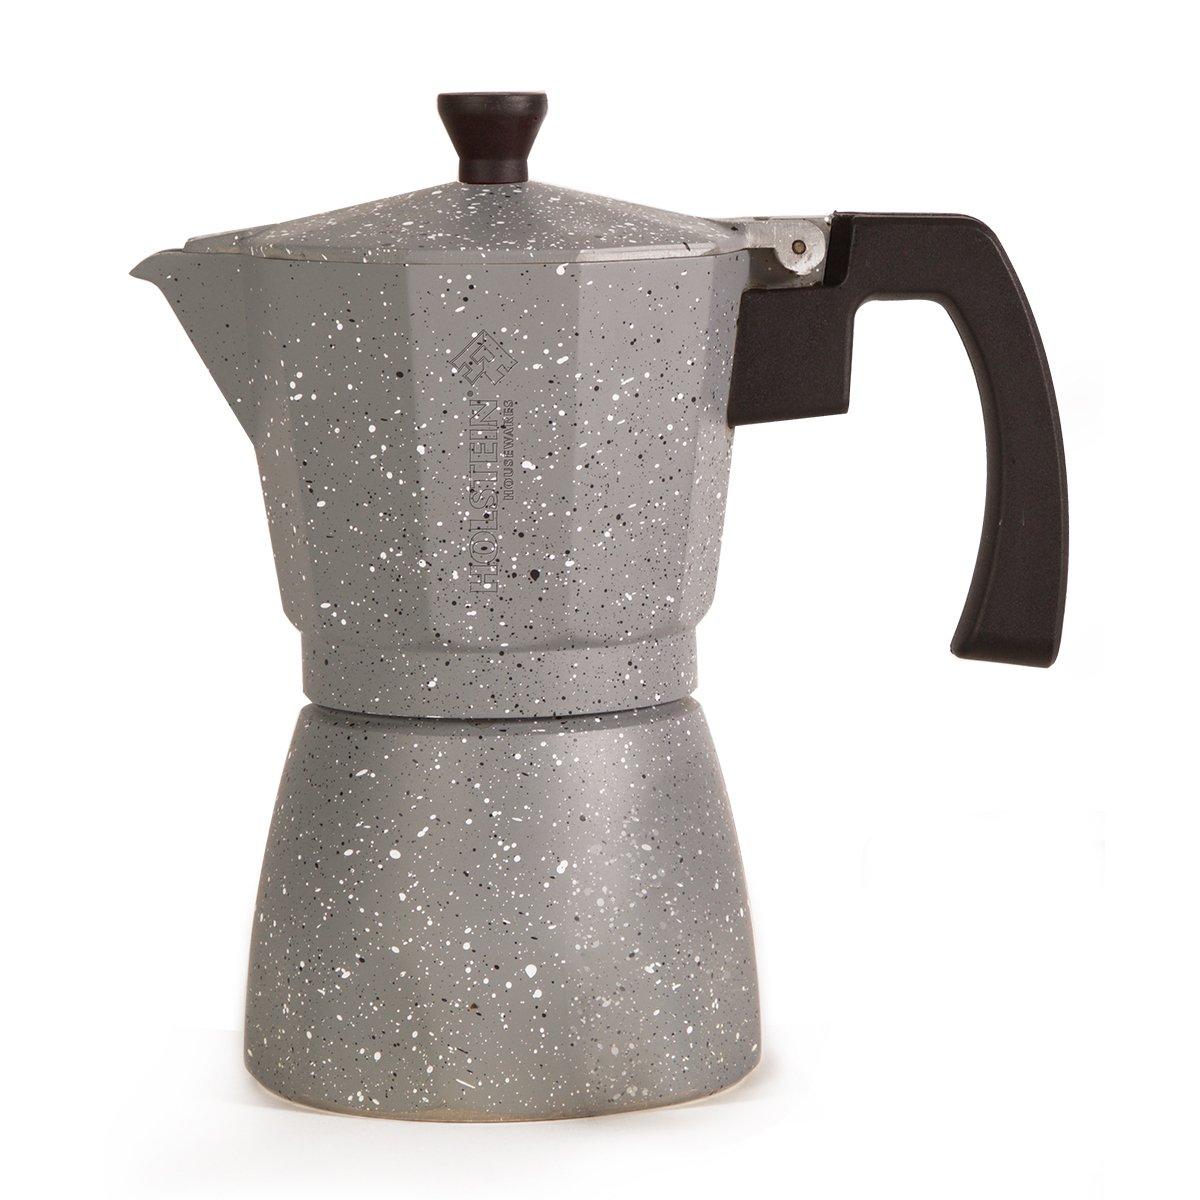 Holstein Housewares H-08080 6-Cup Aluminum Espresso Maker - Marbled